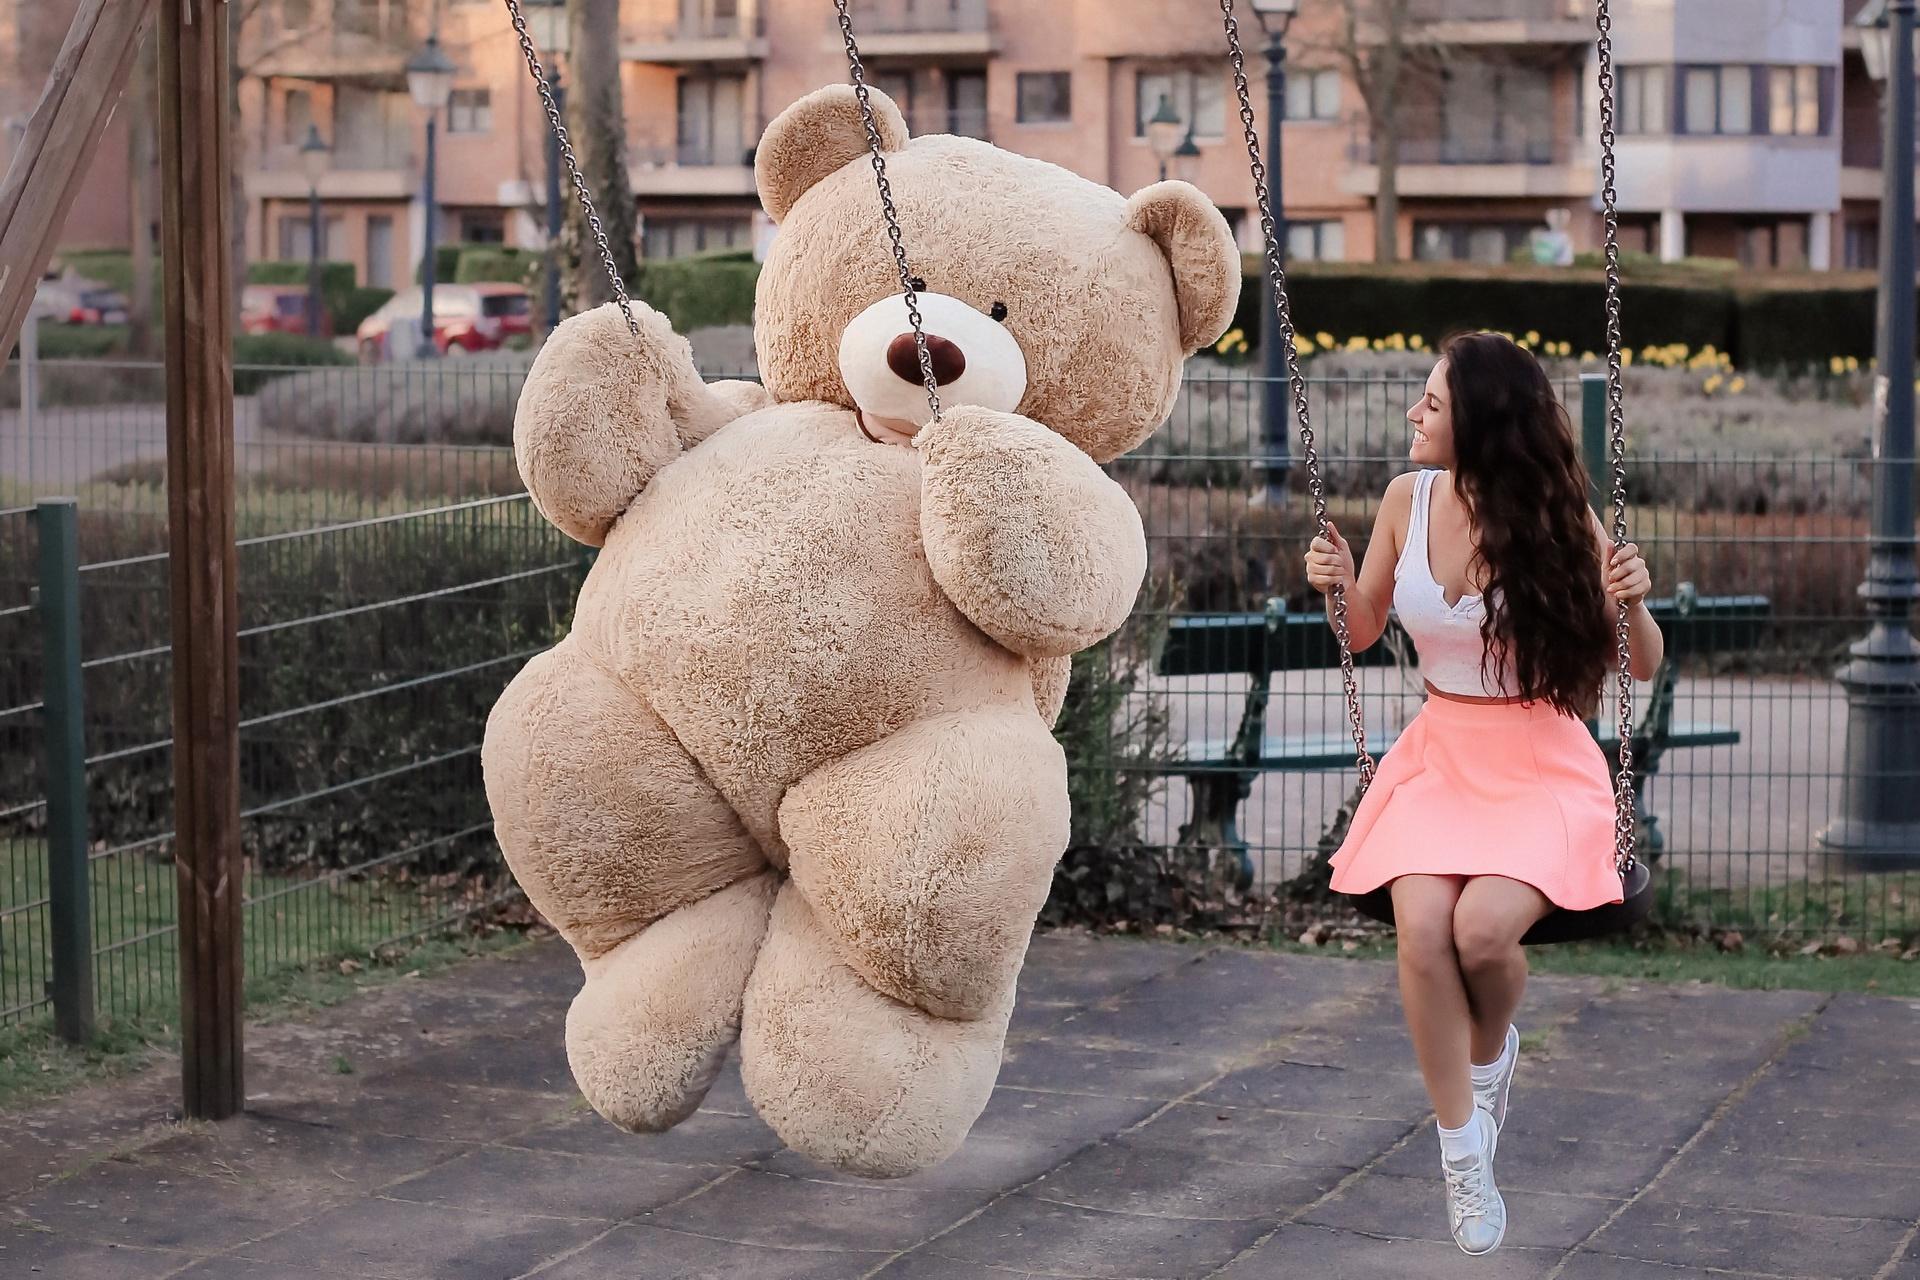 2048x1152 Girl With Big Teddy Bear On Swing 2048x1152